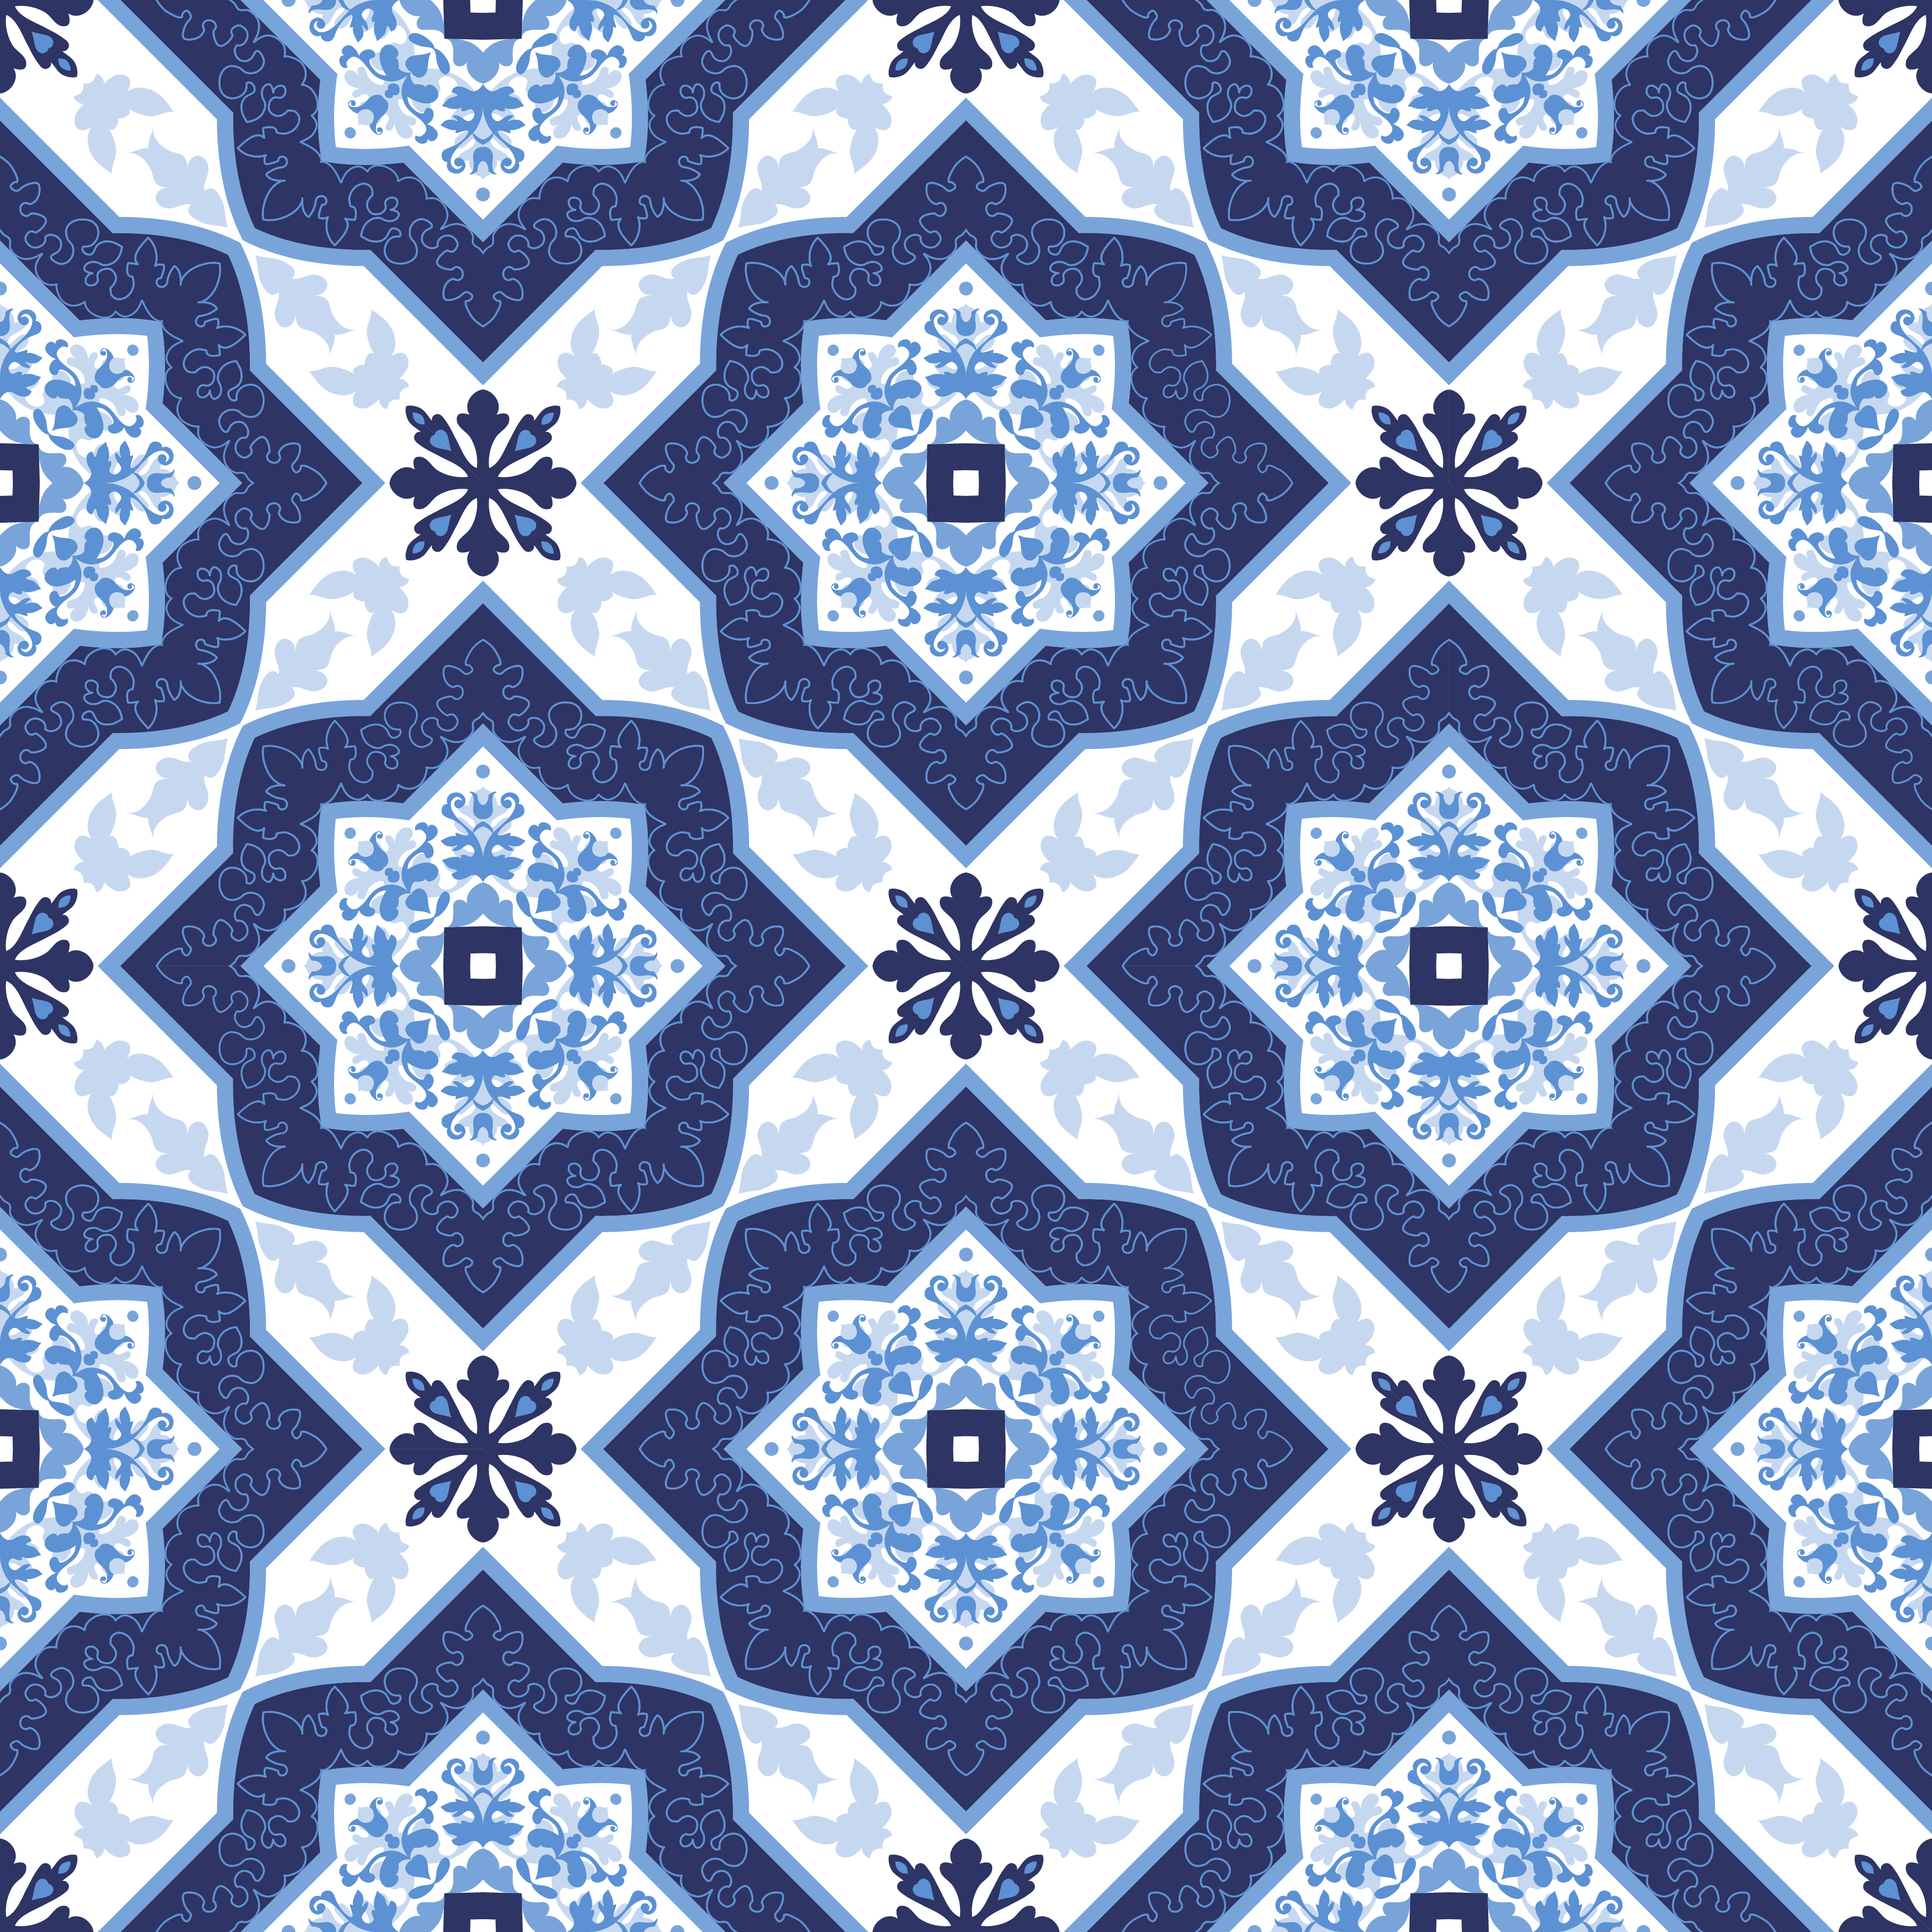 Portuguese Azulejo Tiles Seamless Patterns Download